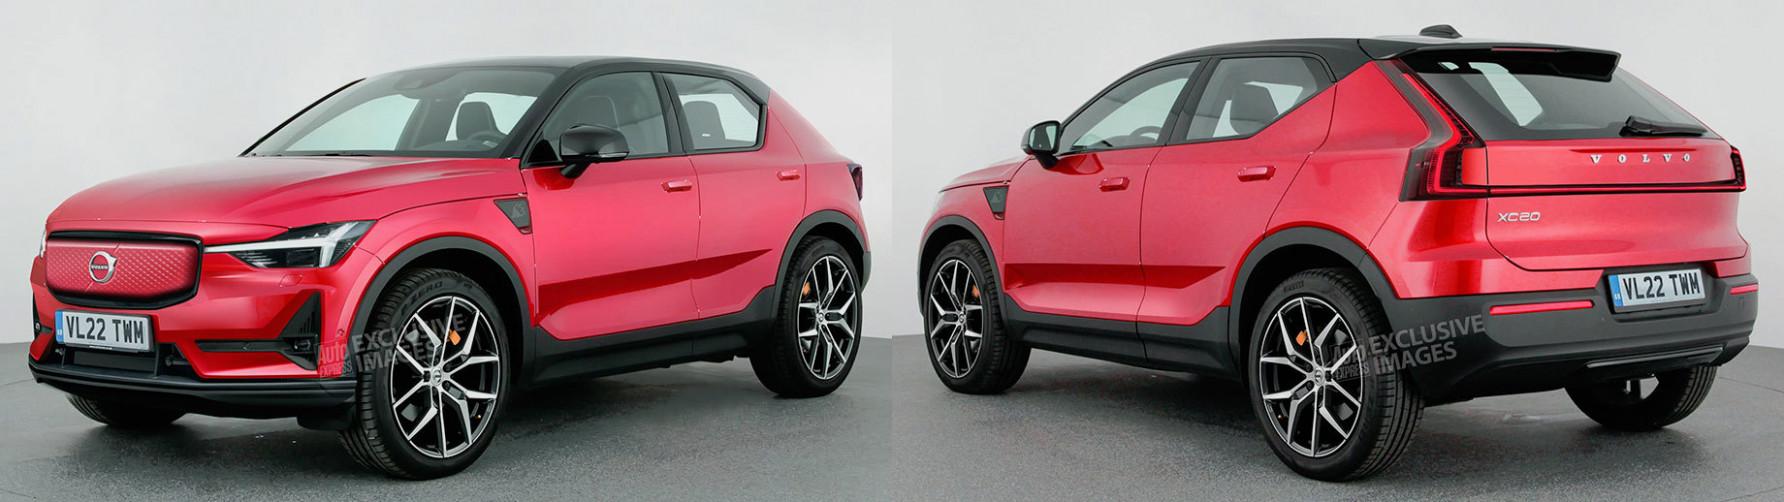 Style Volvo New Models 2022